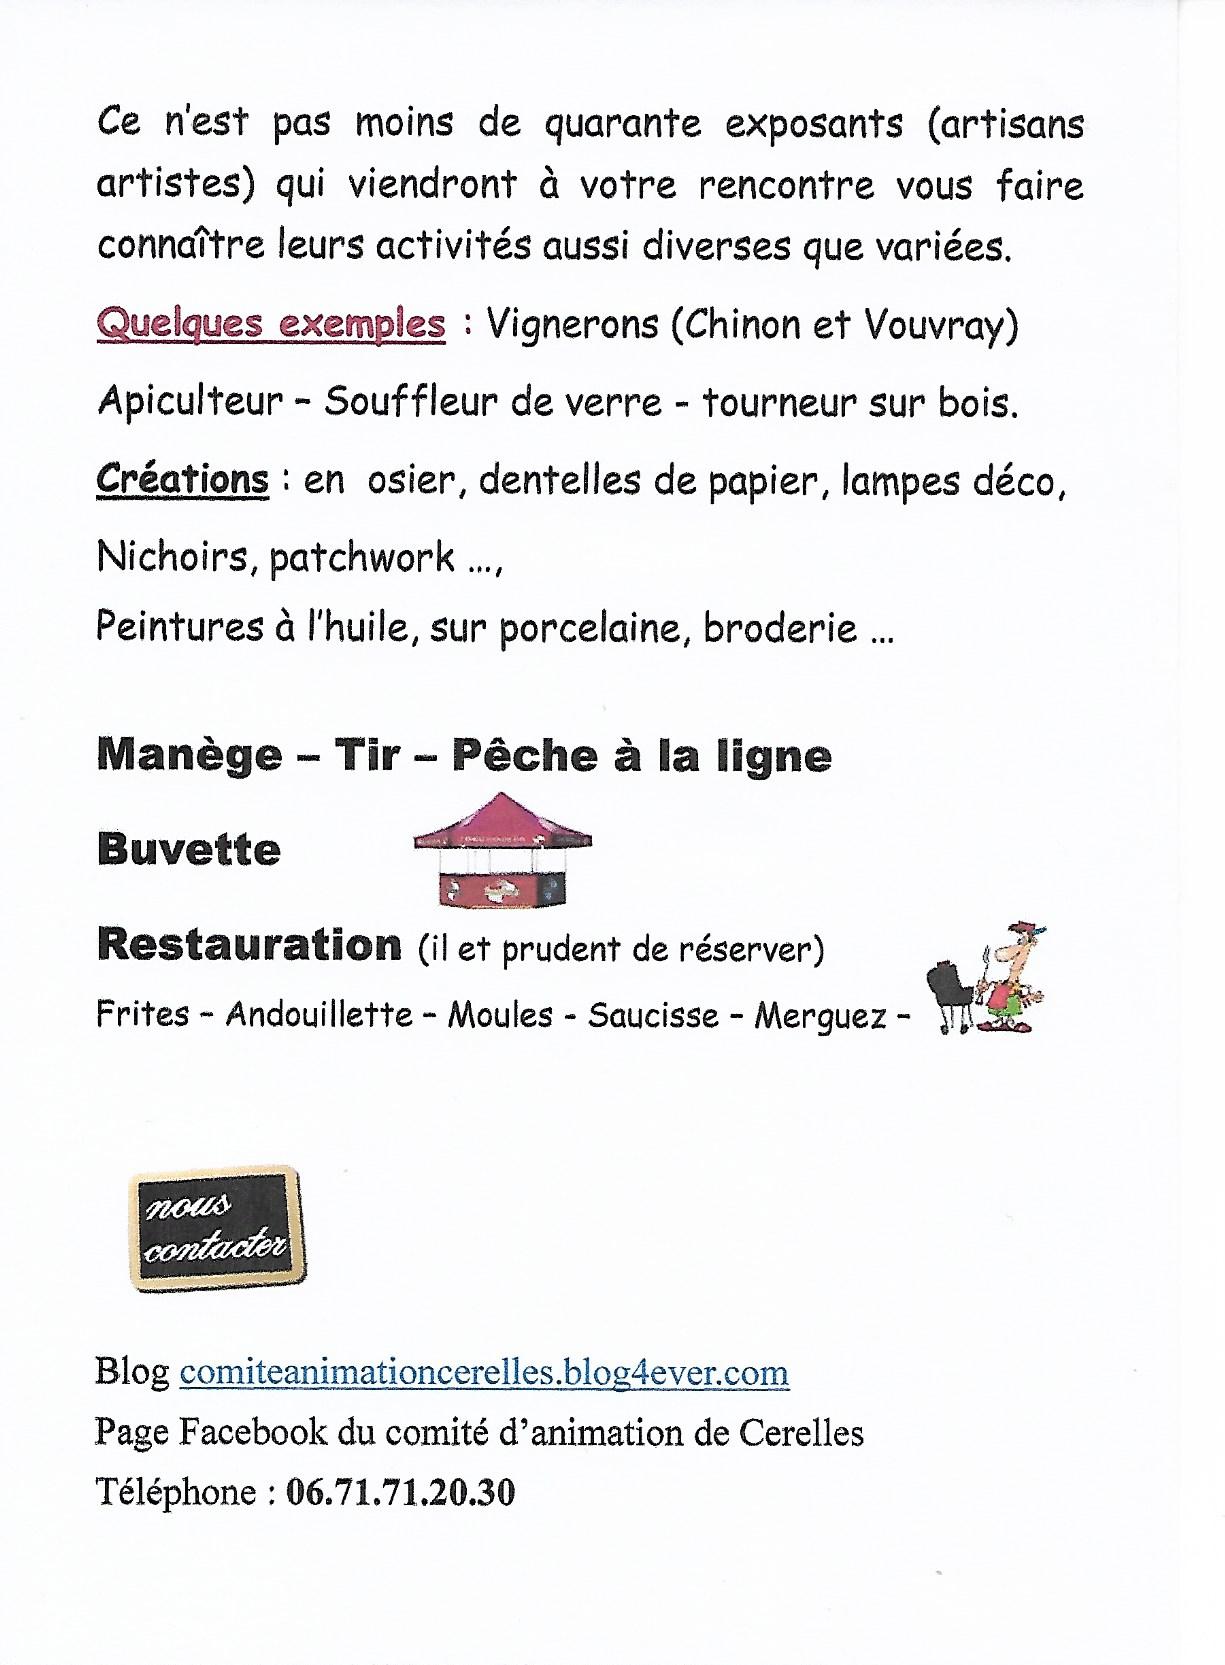 Marché artisanal page 2.jpg